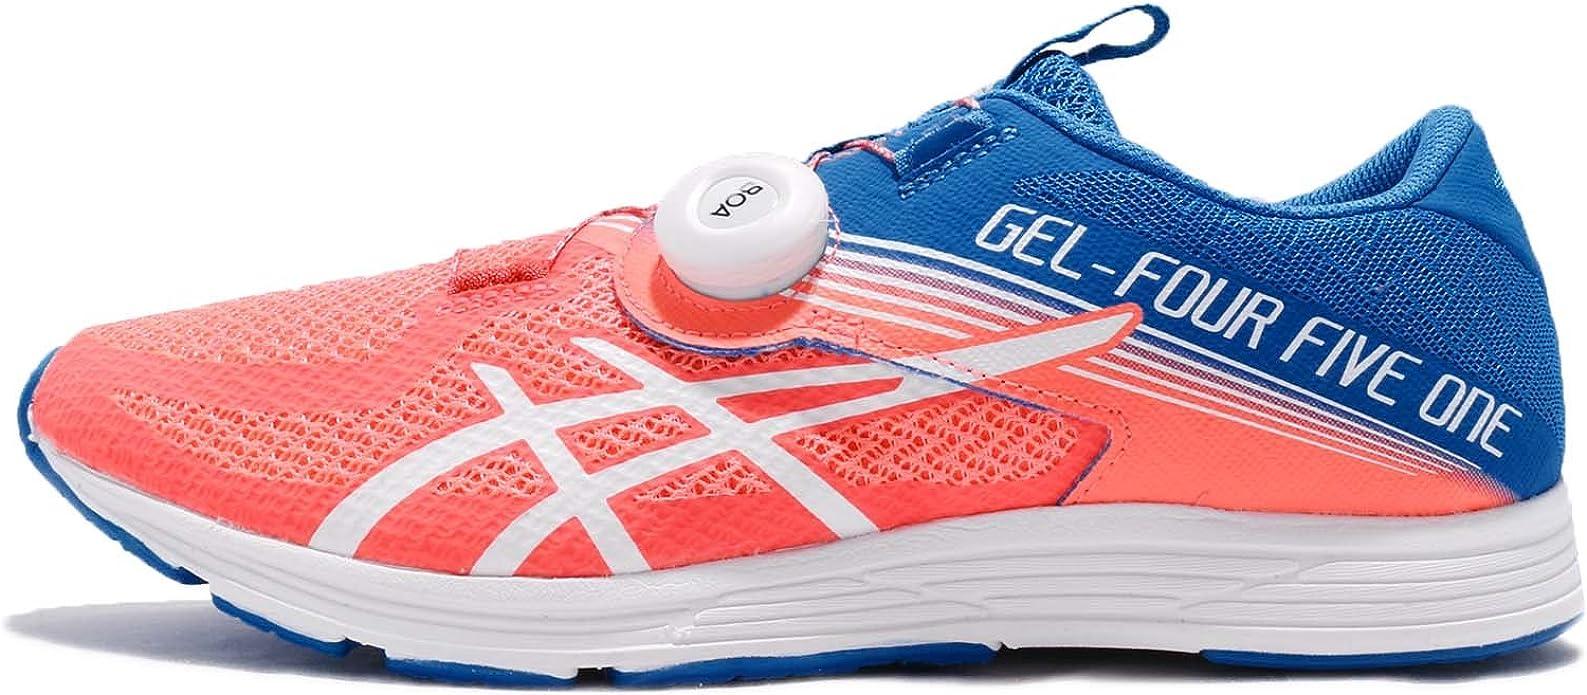 Asics Chaussures Gel-451: Amazon.es: Deportes y aire libre